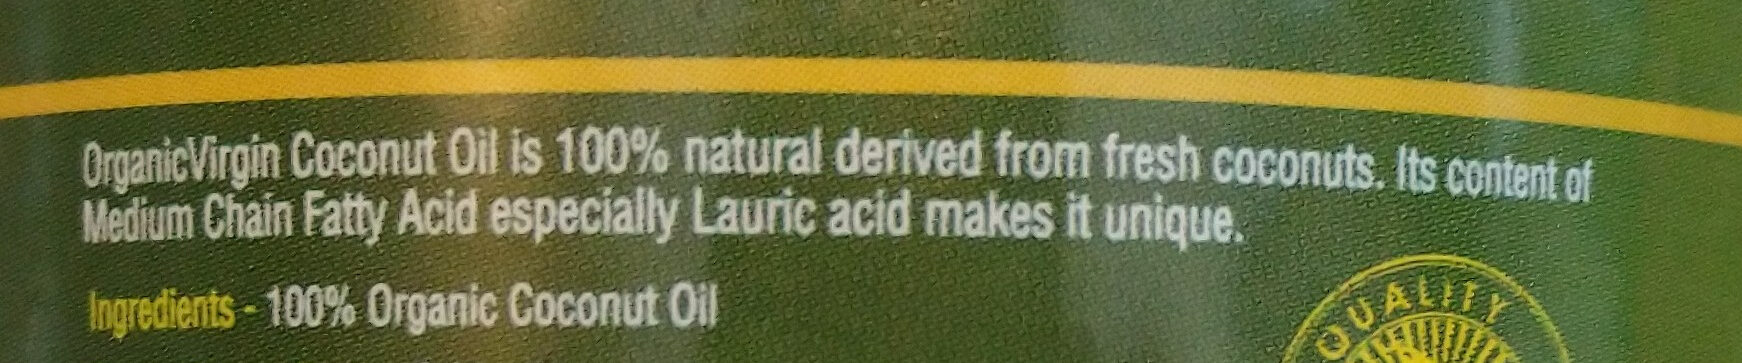 organic Virgin coconut oil - Ingrediënten - it